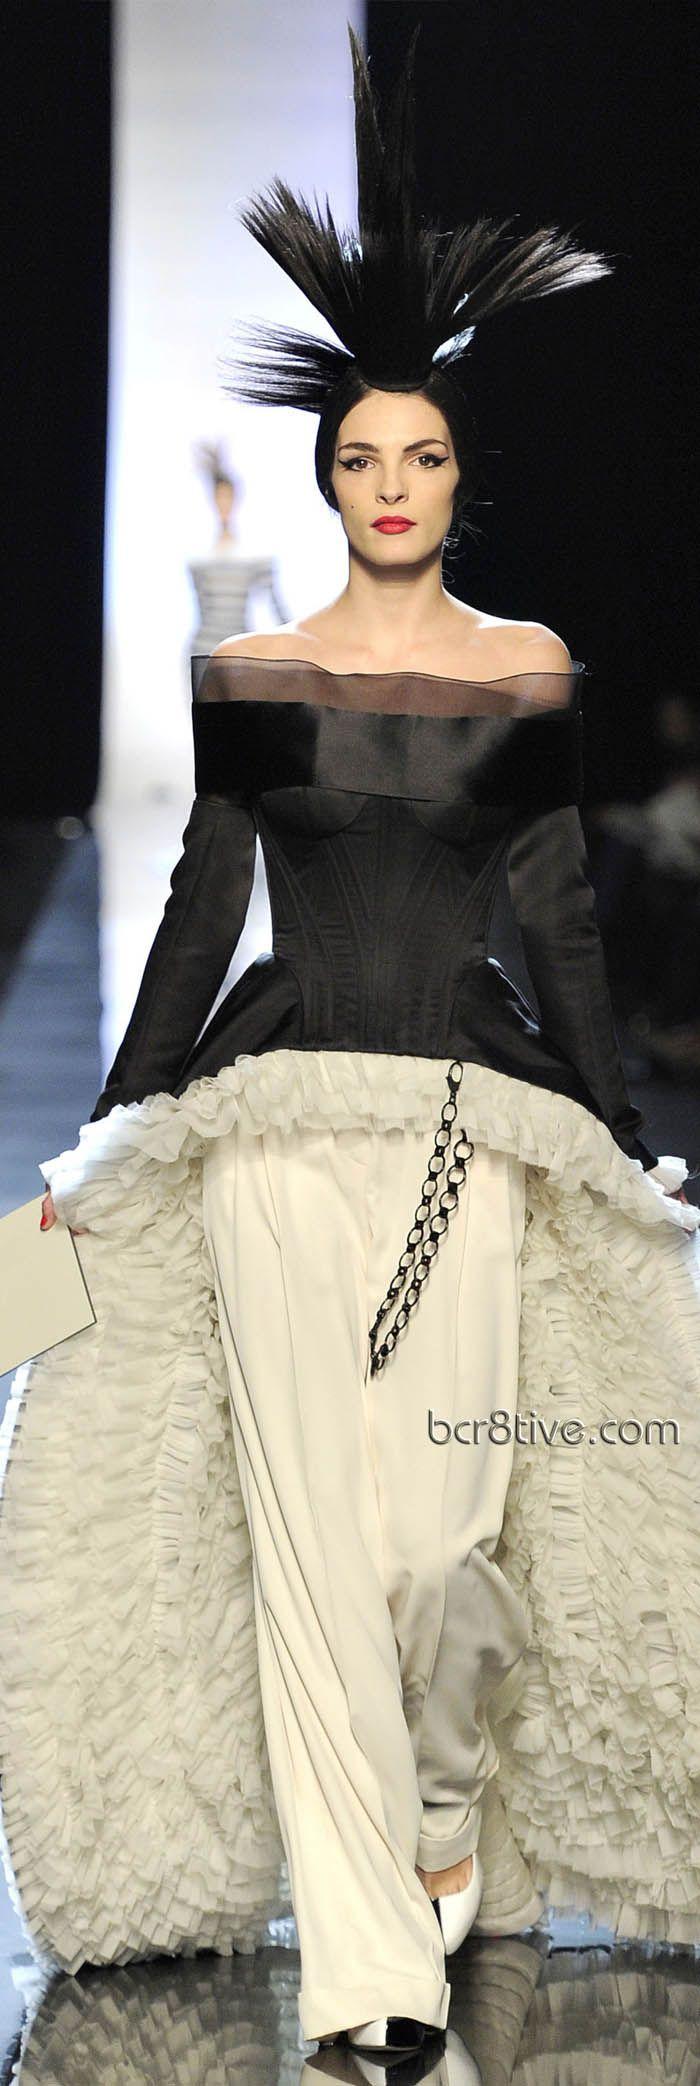 Jean Paul Gaultier Haute Couture.  V